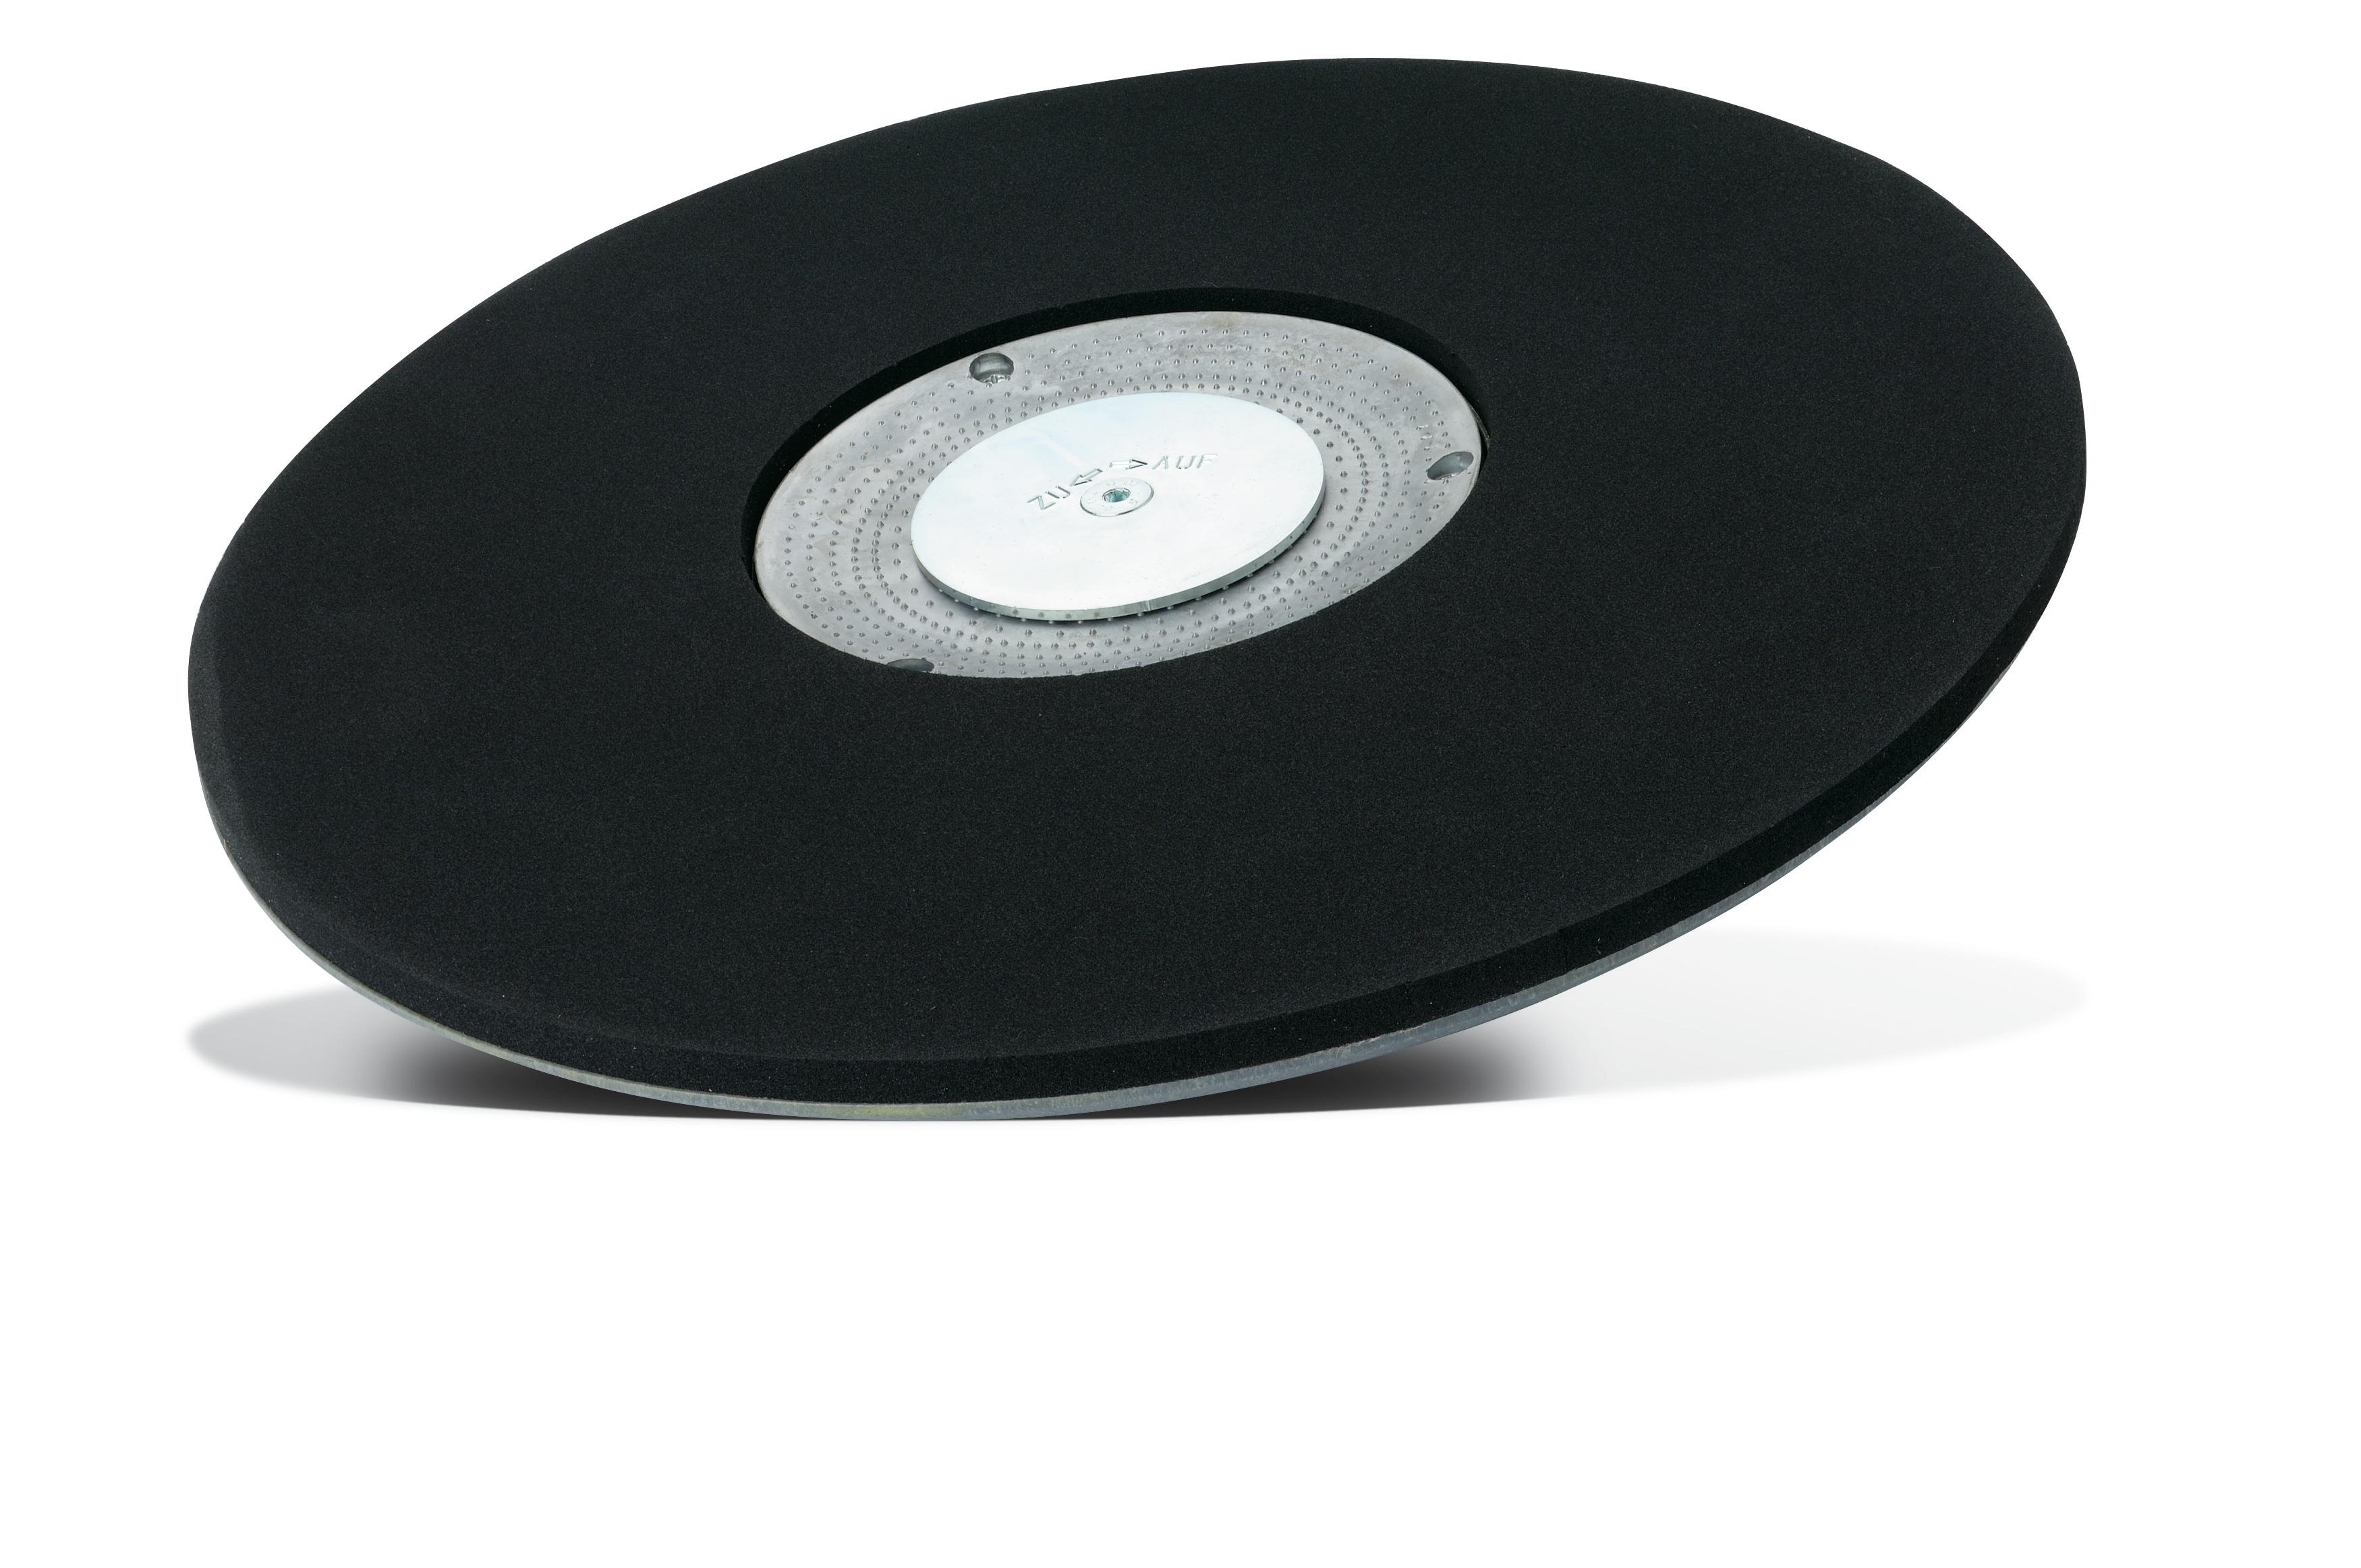 Disc holder with rubber-foam padding 420 mm diameter Pajarito